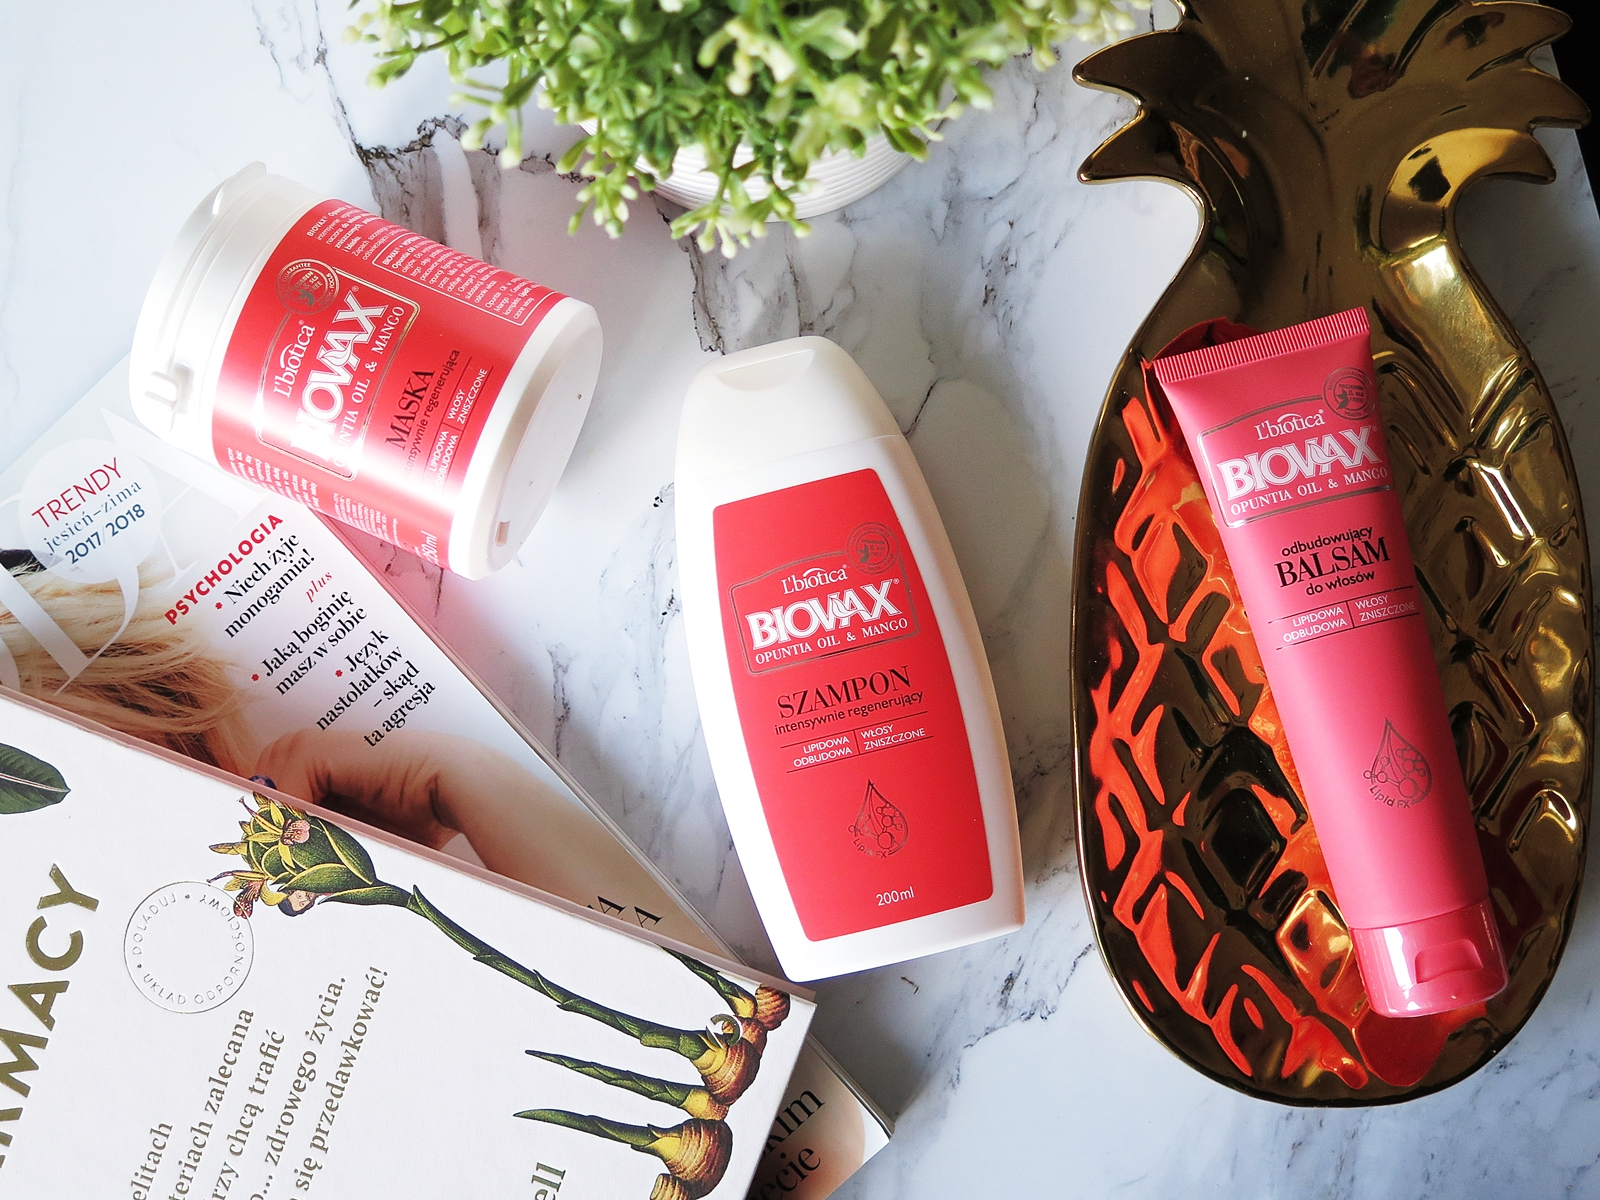 Włosy | L'biotica, Opuntia oil & Mango